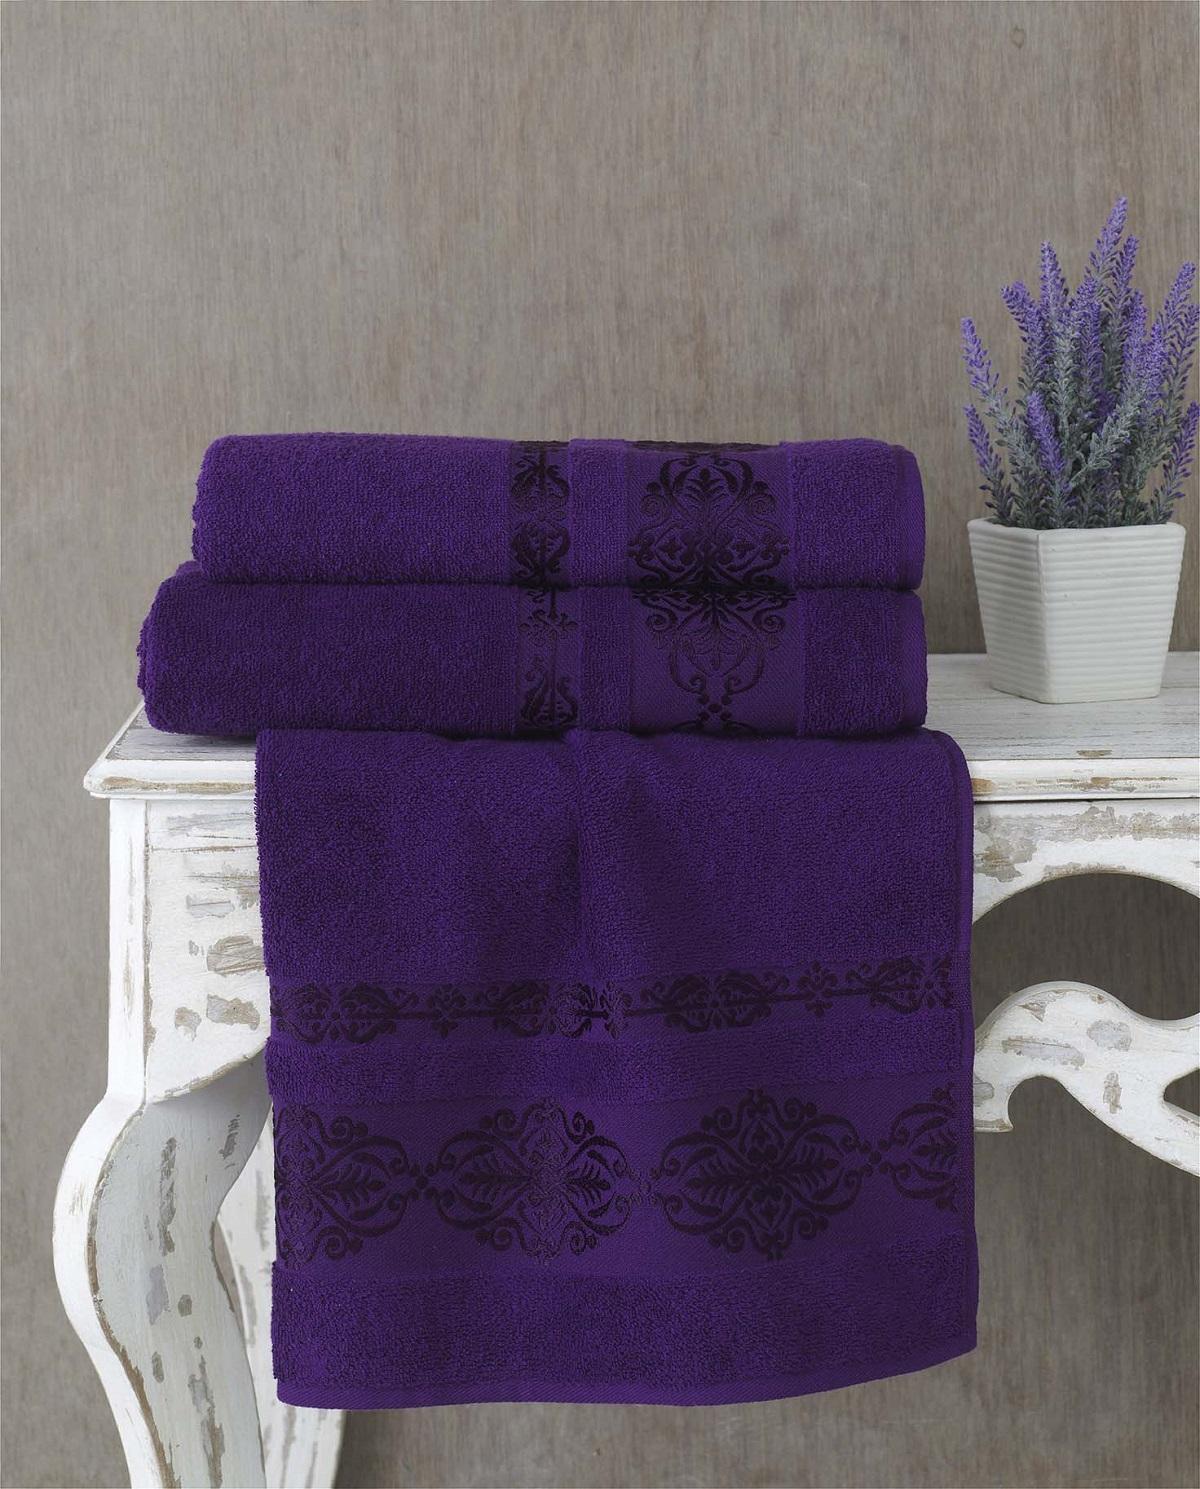 Полотенца Karna Полотенце Rebeka Цвет: Фиолетовый (70х140 см) karna karna полотенце innes цвет красный 70х140 см